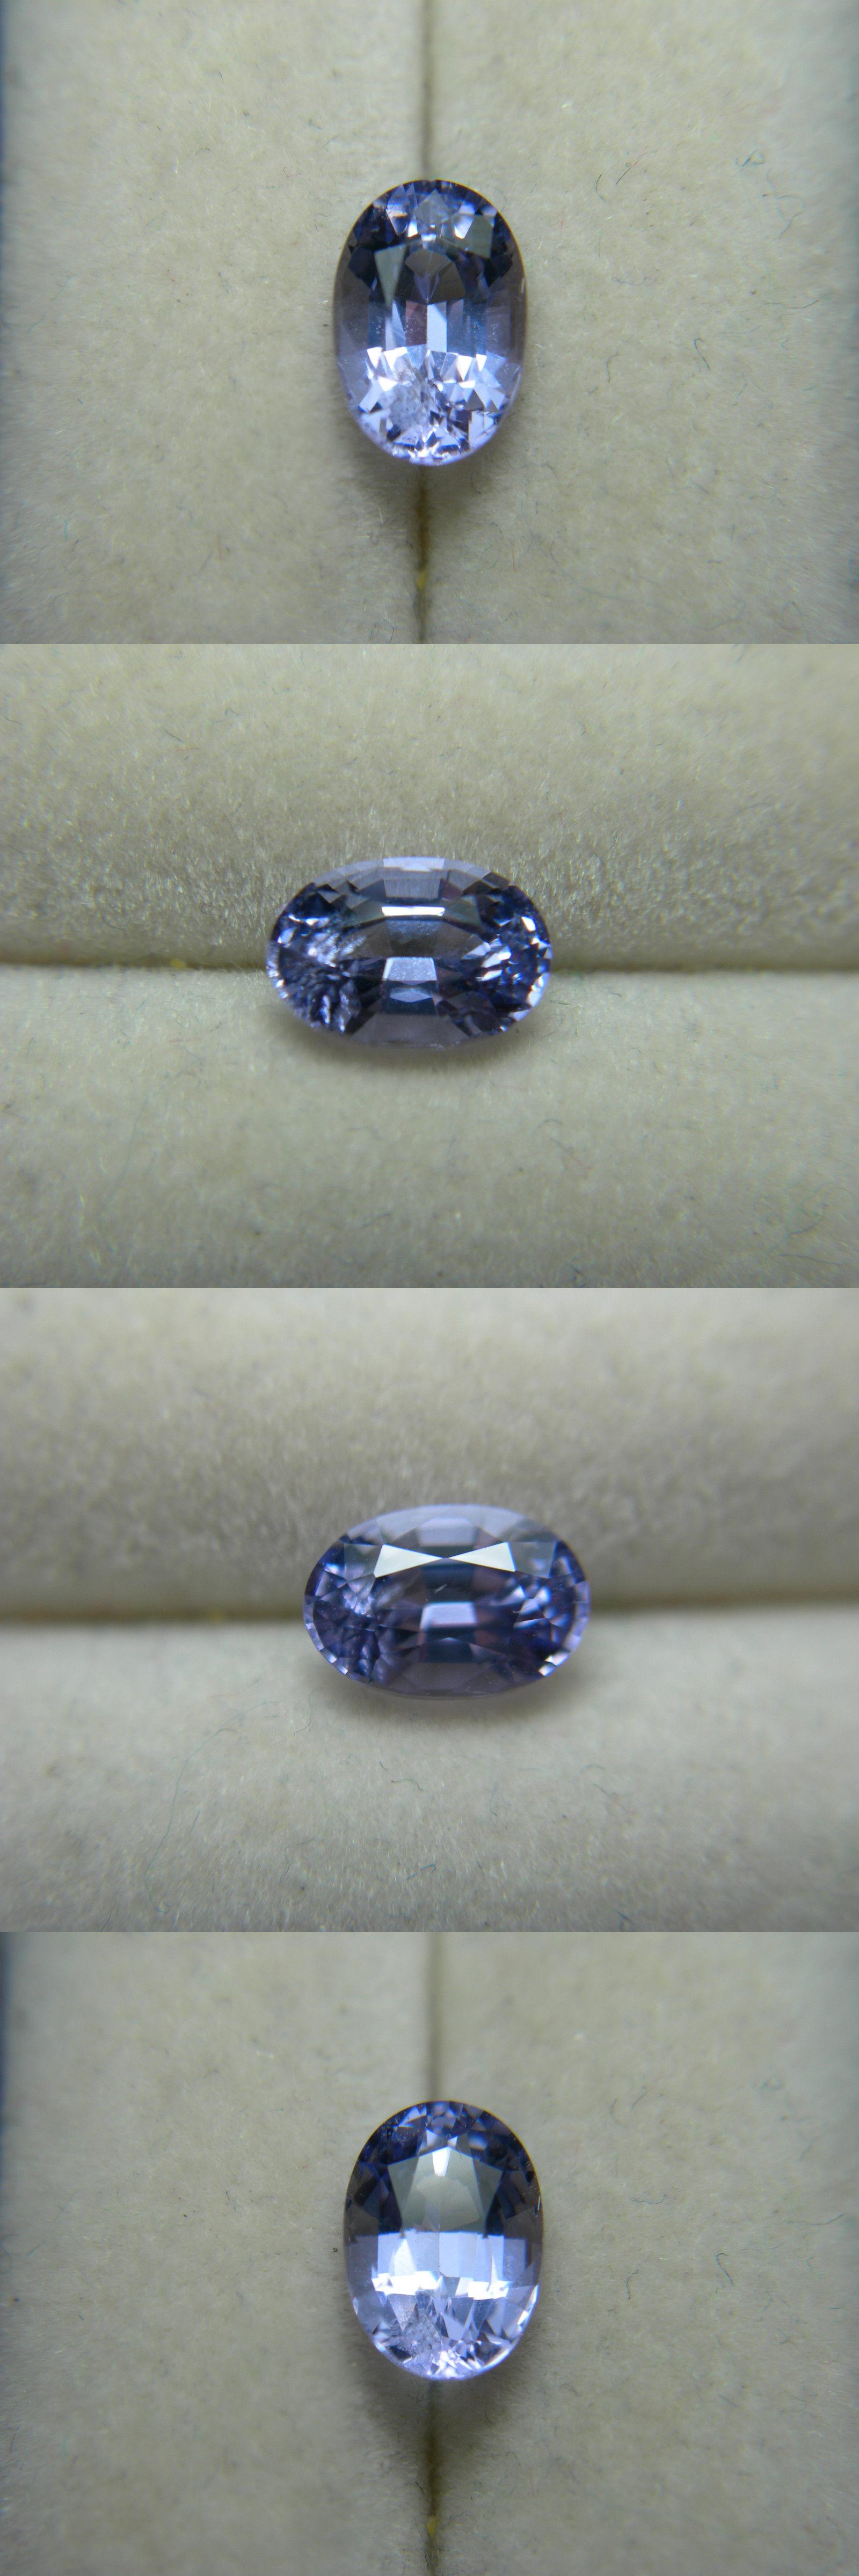 Spinel 110873: Very Rare Violet Blue Spinel Gem Luc Yen Vietnam ...